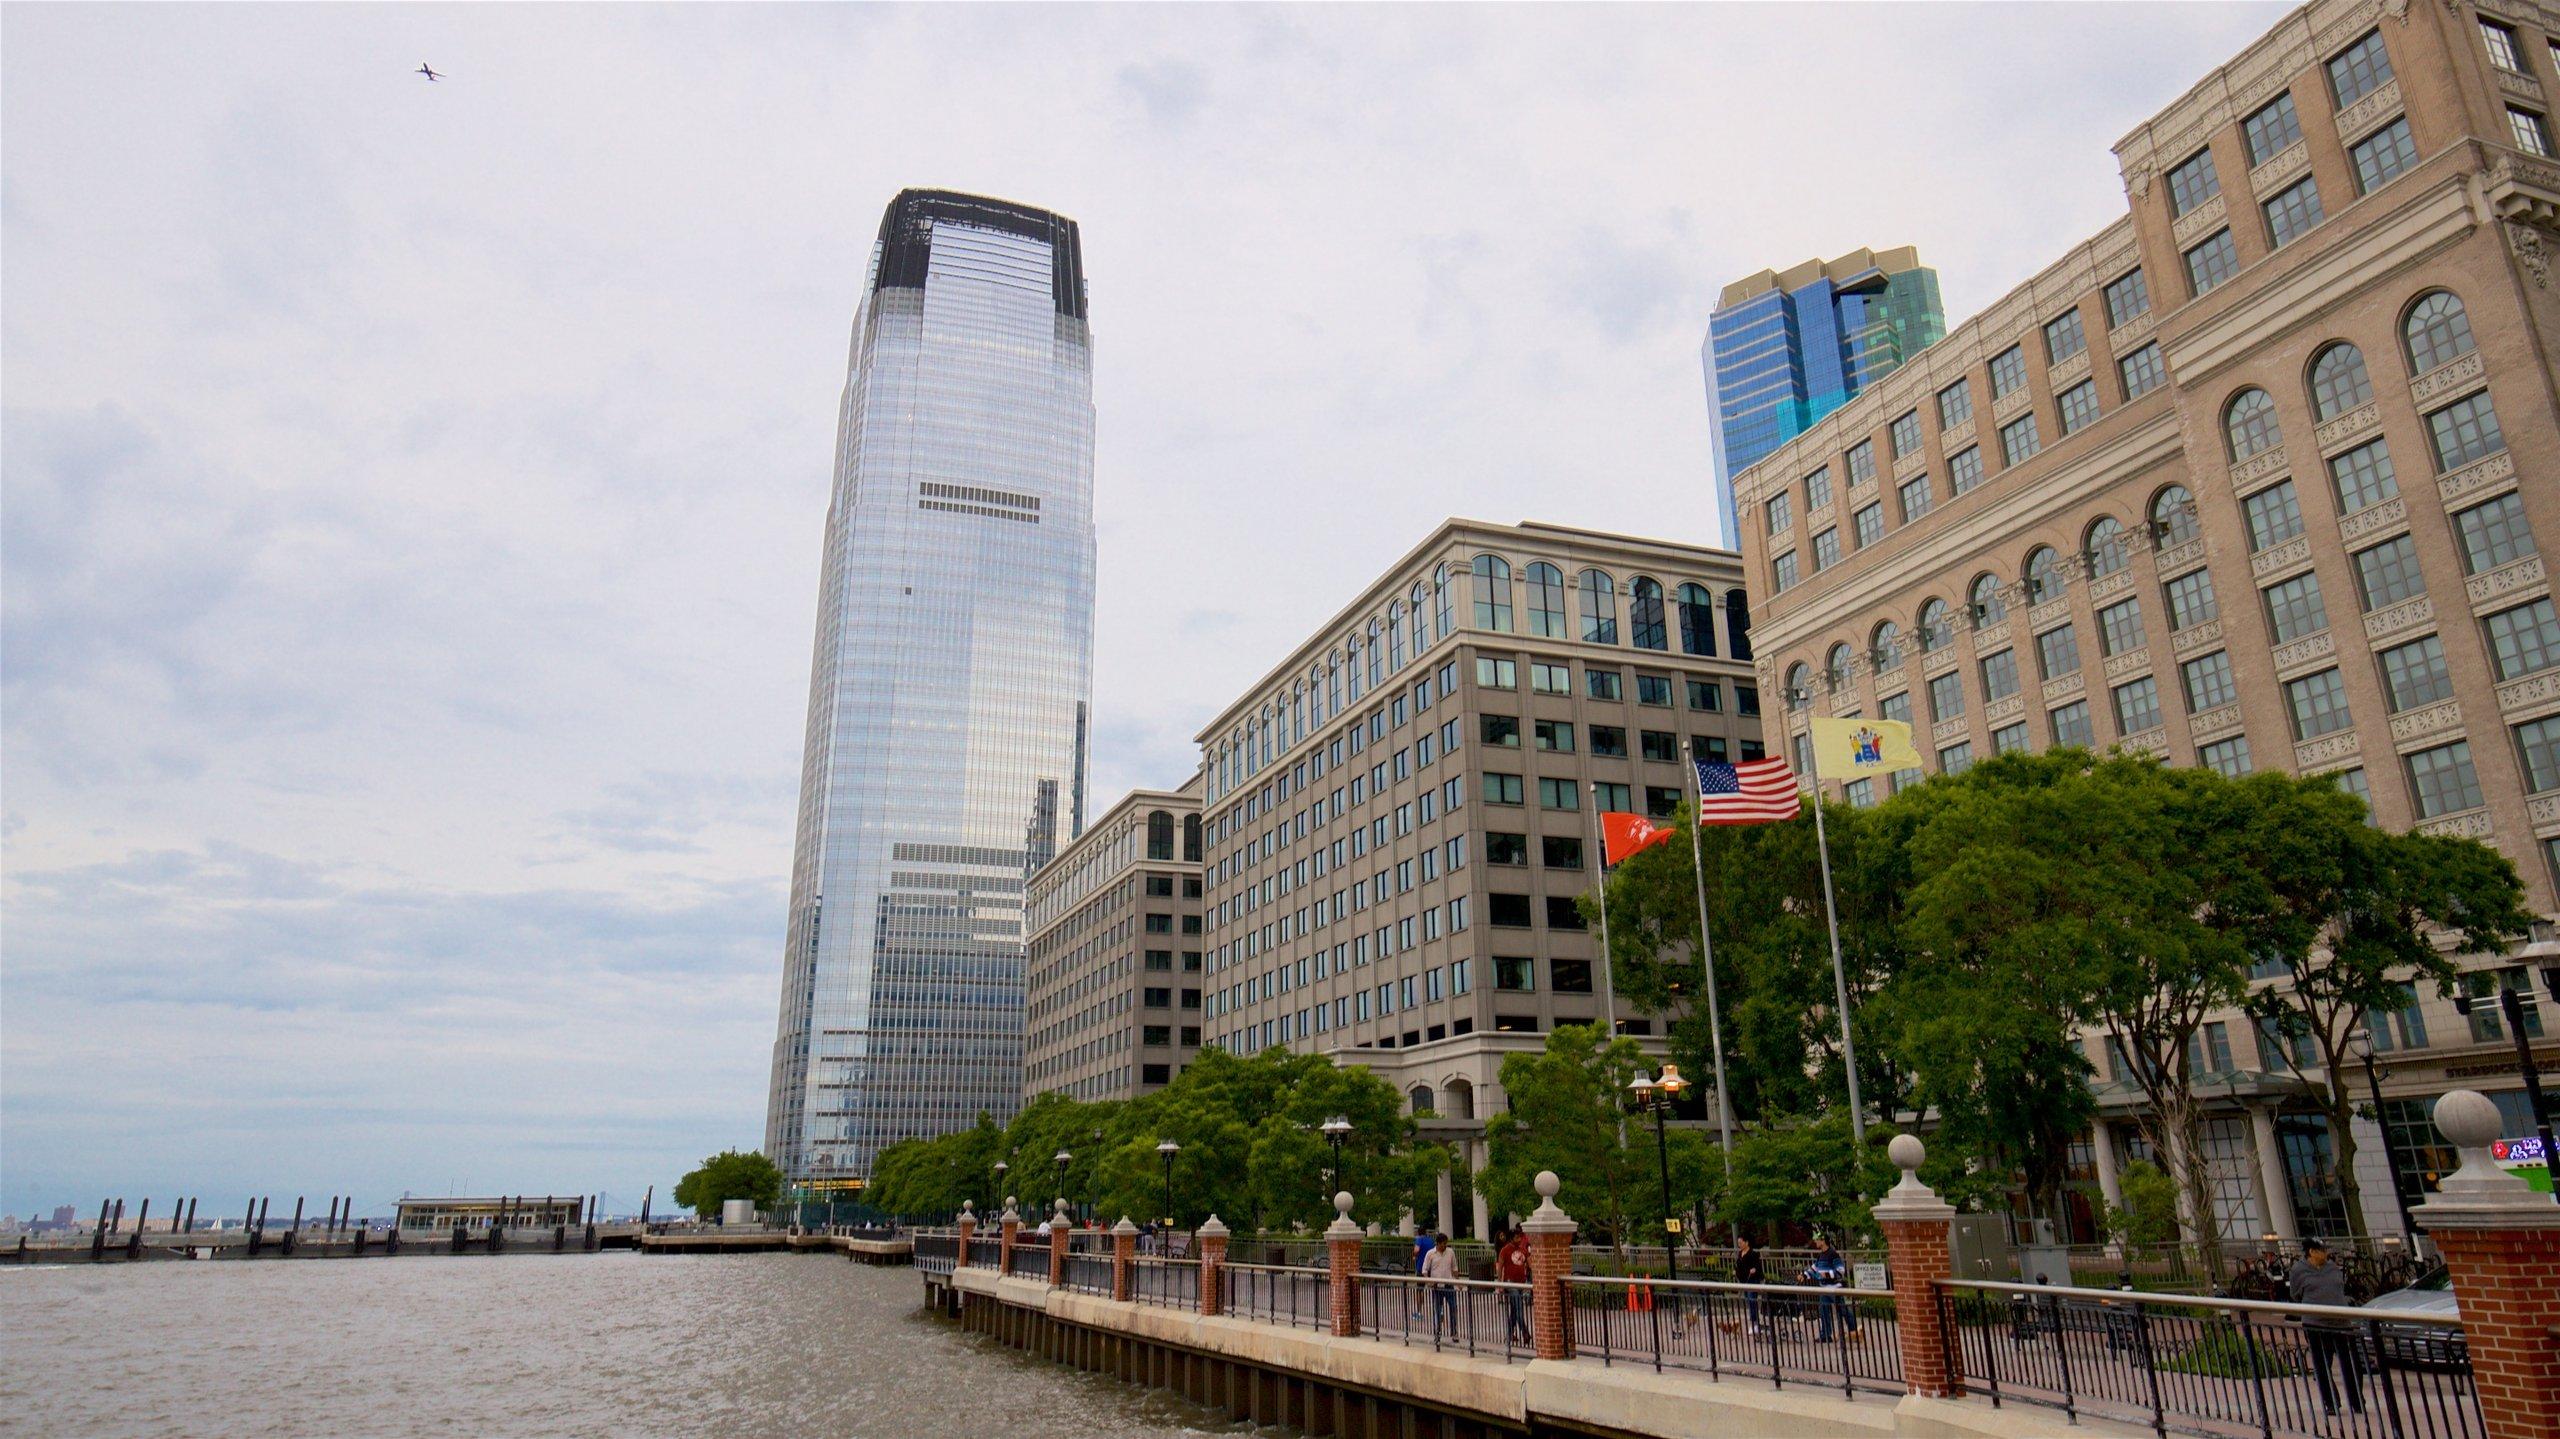 Goldman Sachs Tower, Jersey City, New Jersey, United States of America